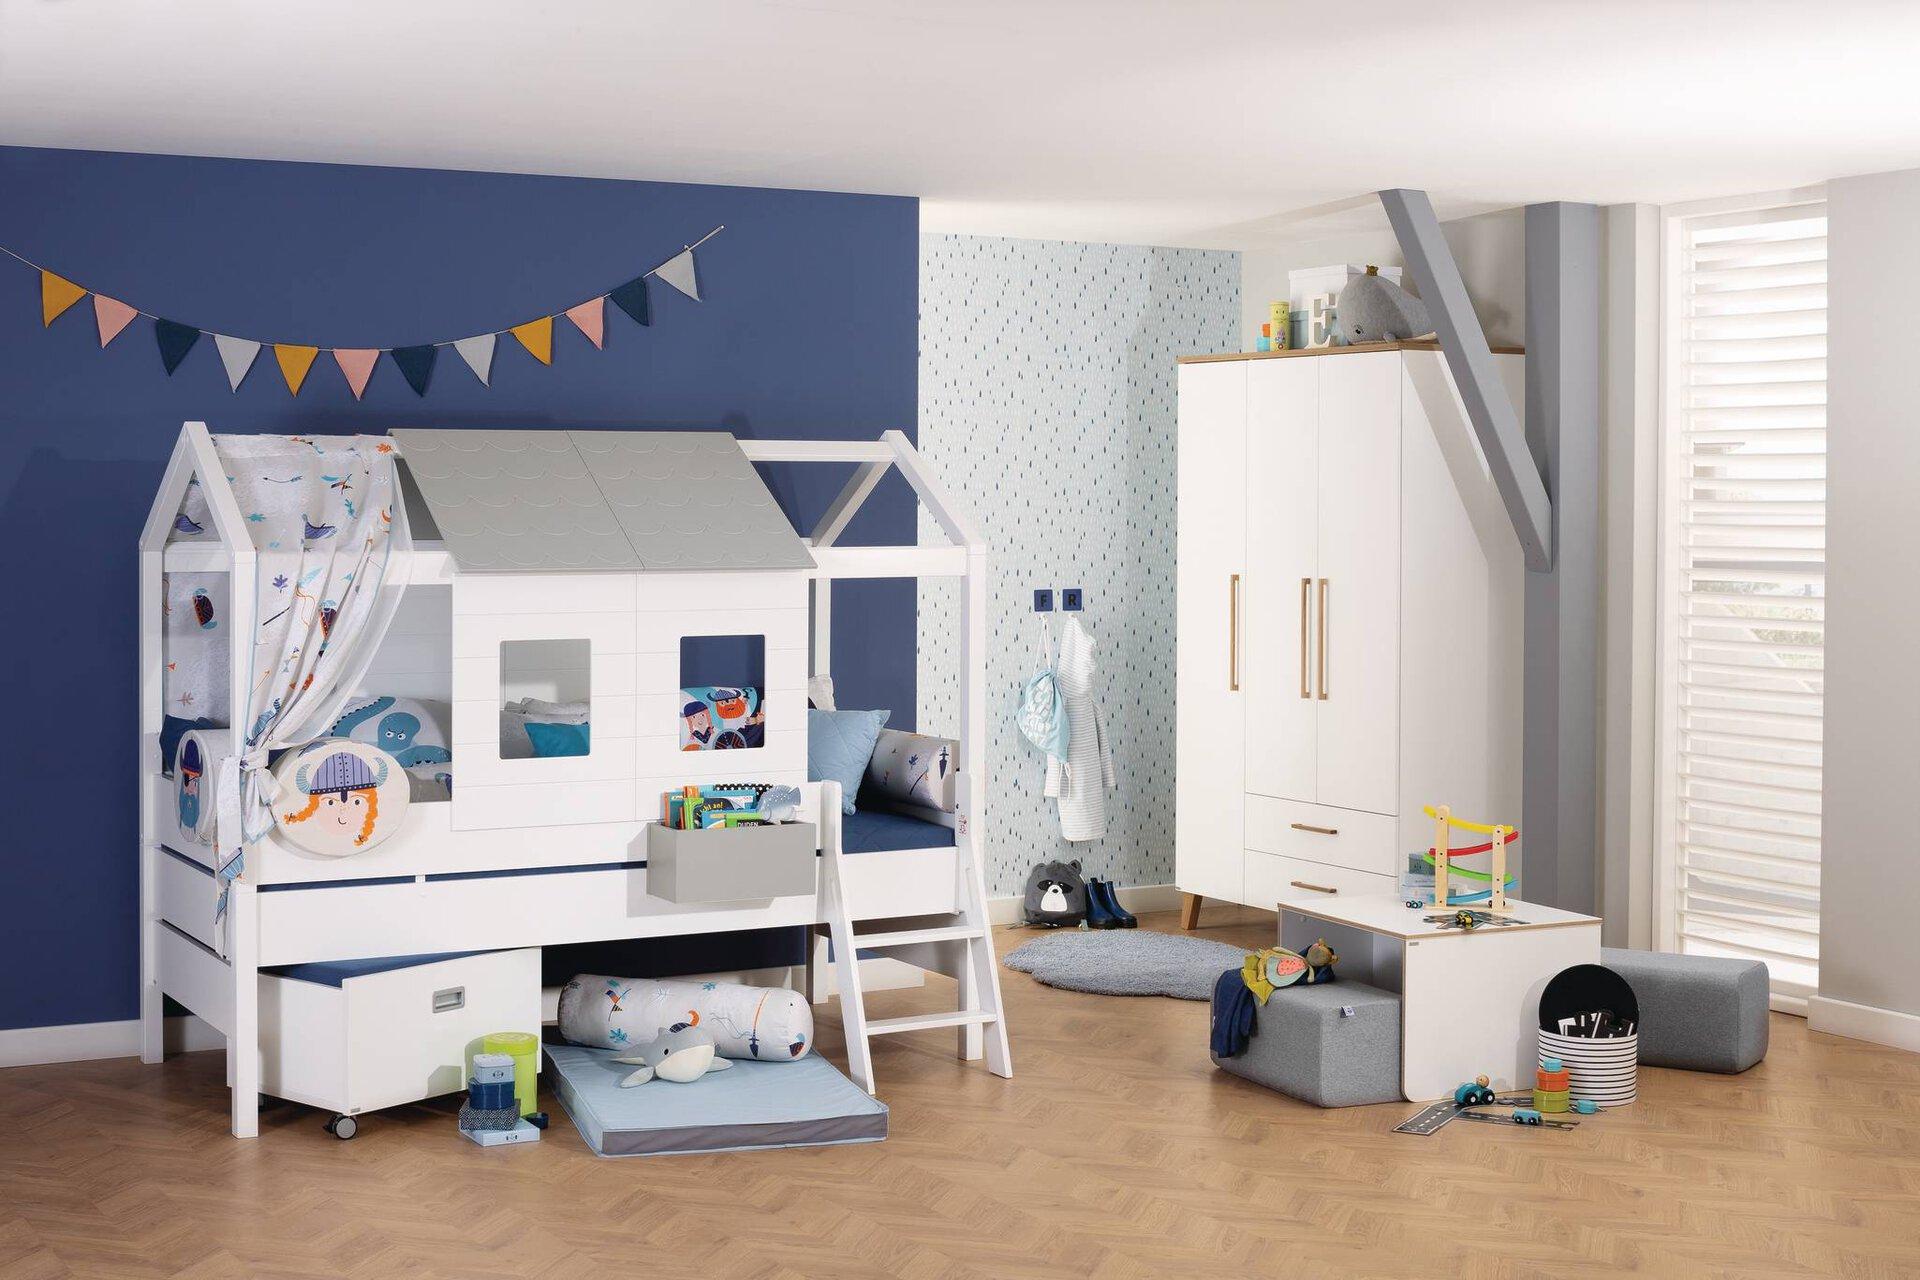 Kinderbett TINY HOUSE PAIDI Holzwerkstoff weiß 210 x 100 x 175 cm